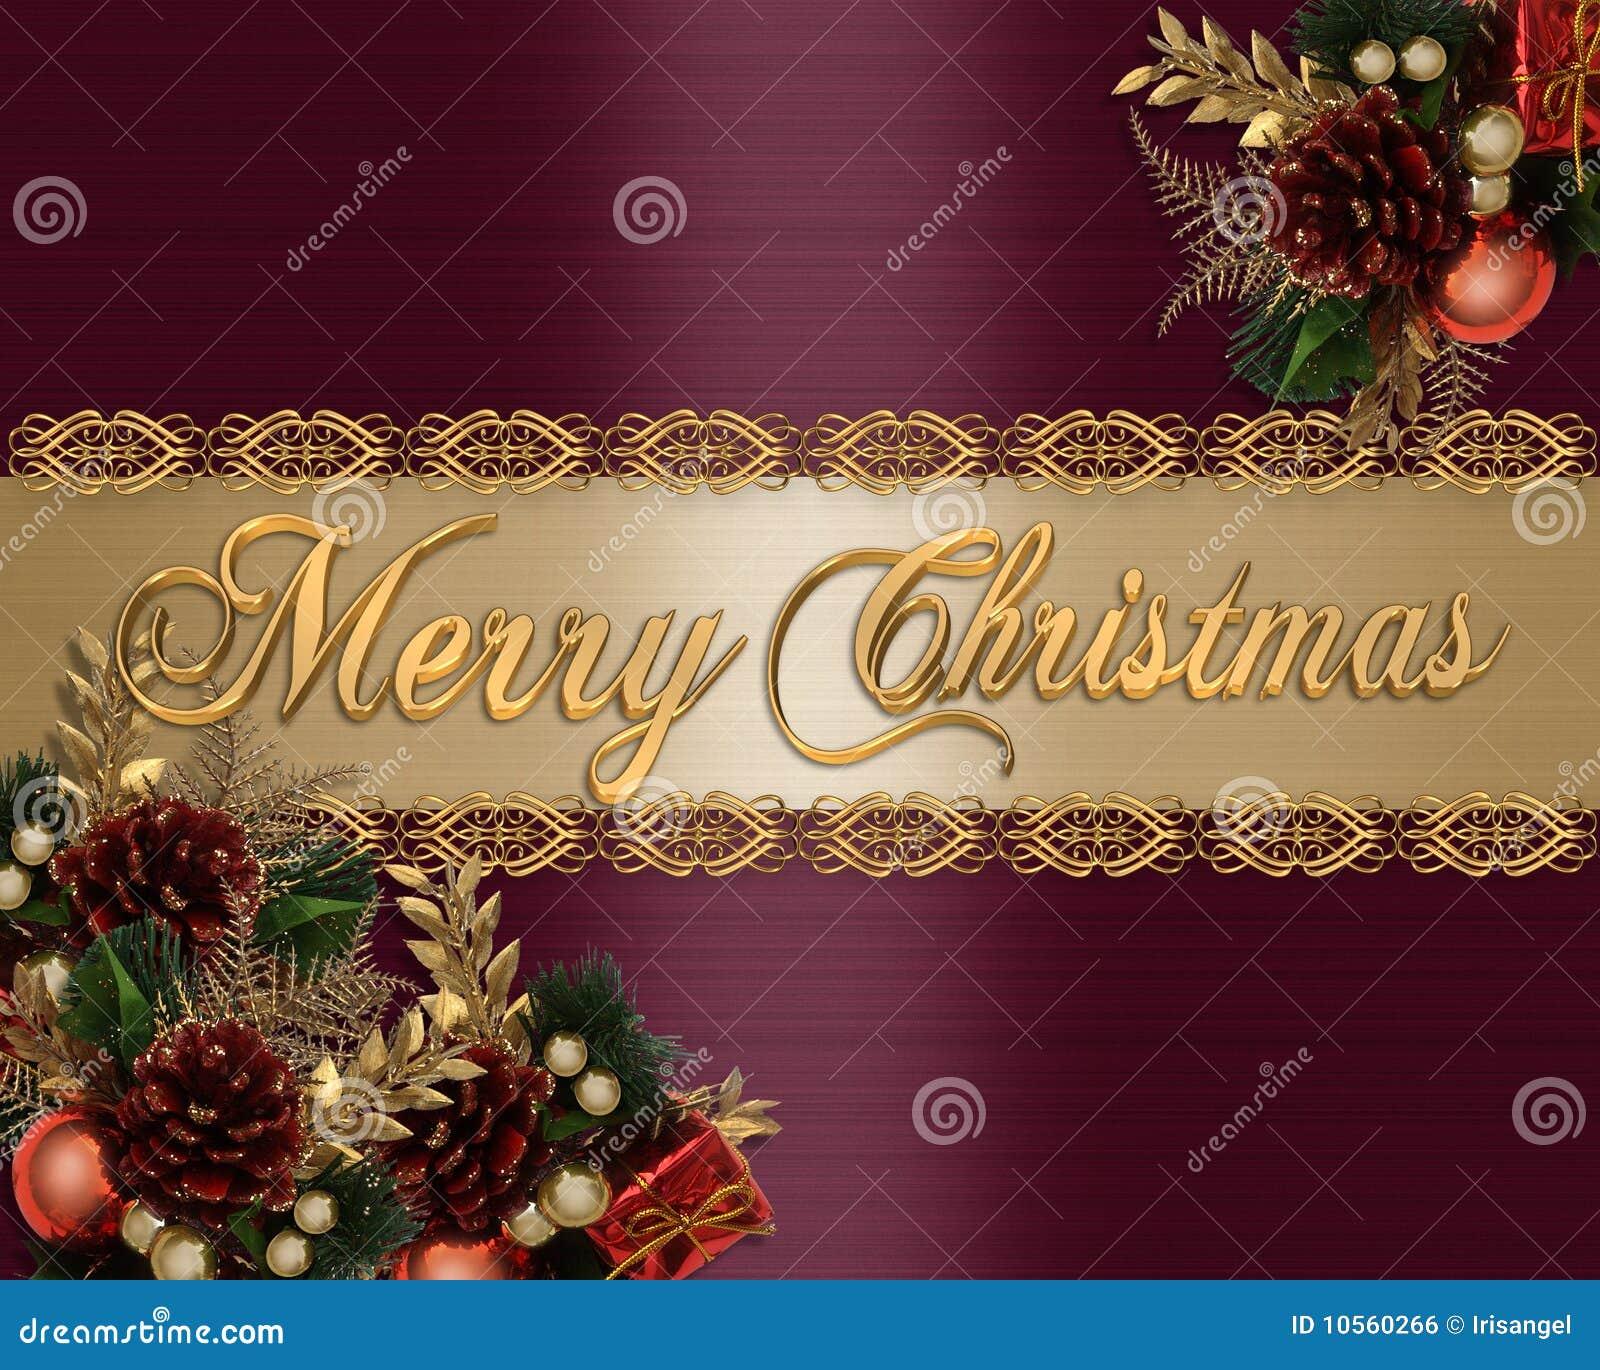 christmas card background elegant vector illustration - Elegant Christmas Cards